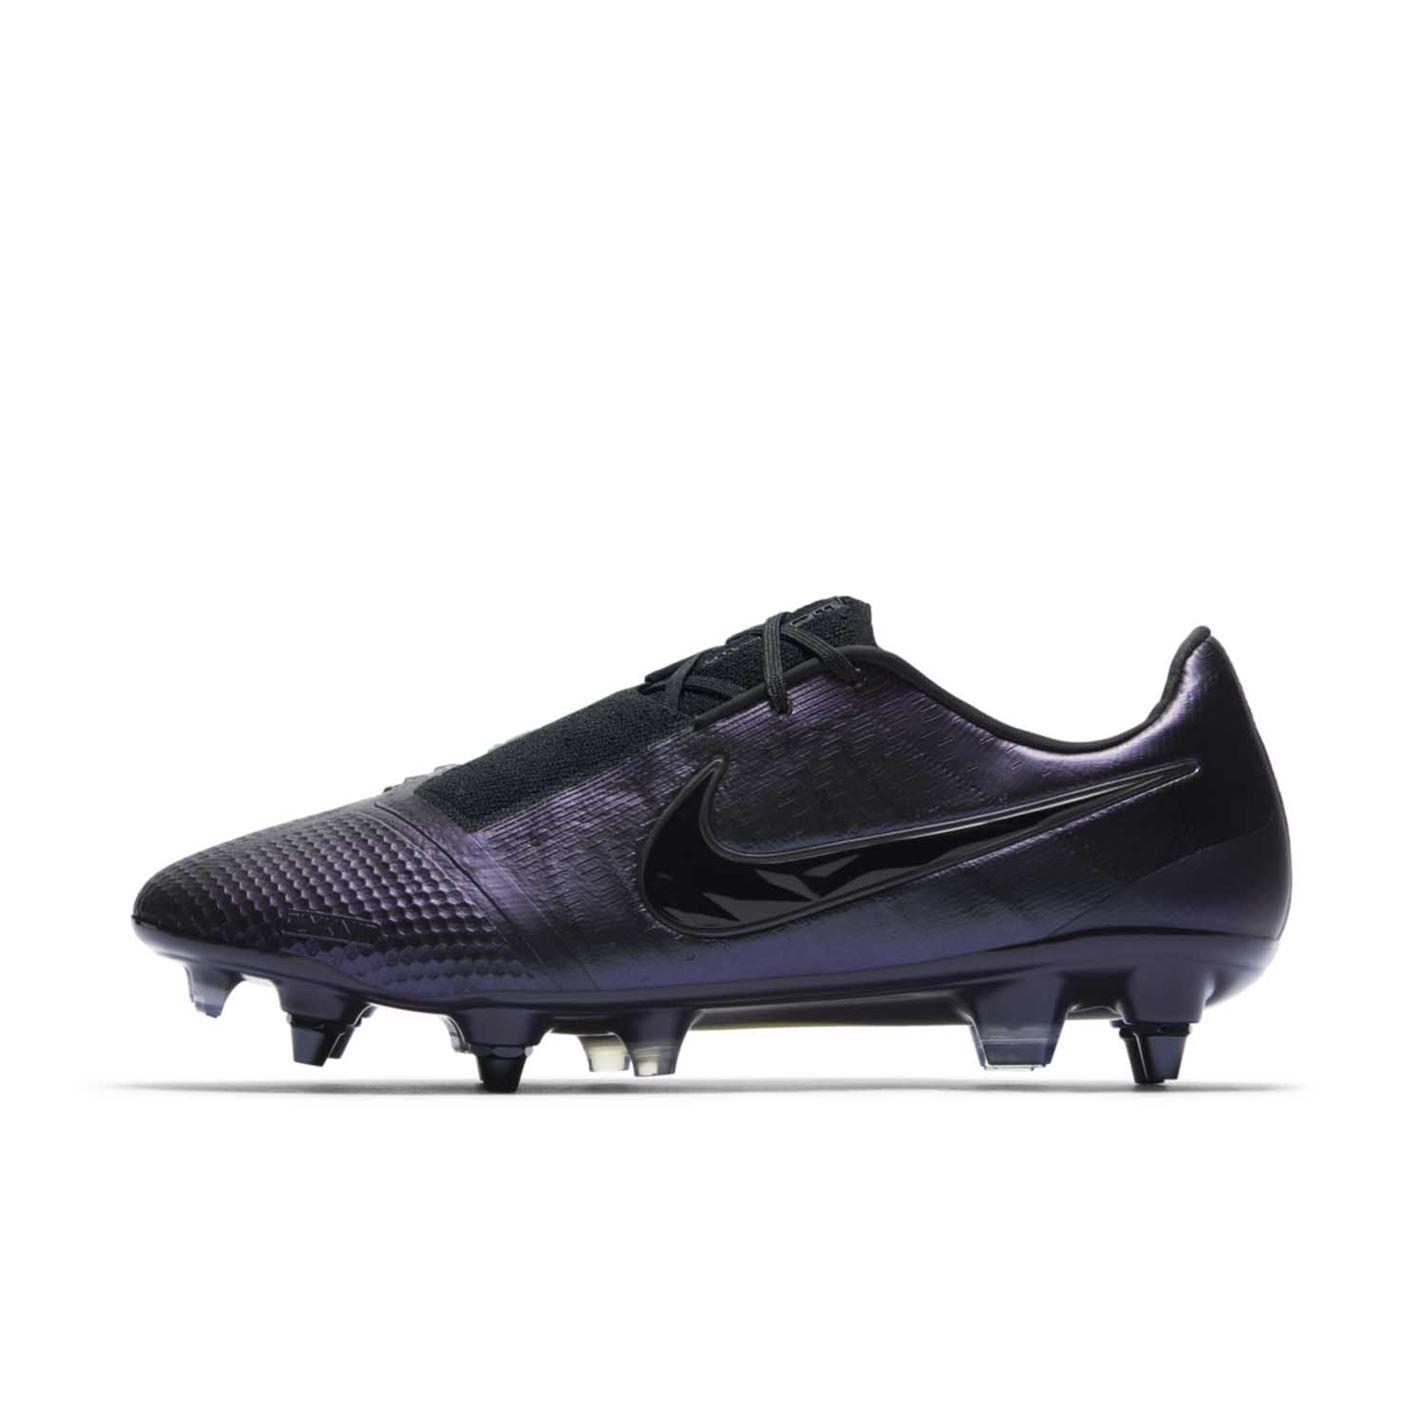 Nike-Phantom-Venom-Elite-Homme-SG-Terrain-Souple-Chaussures-De-Football-Chaussures-de-foot-crampons miniature 5